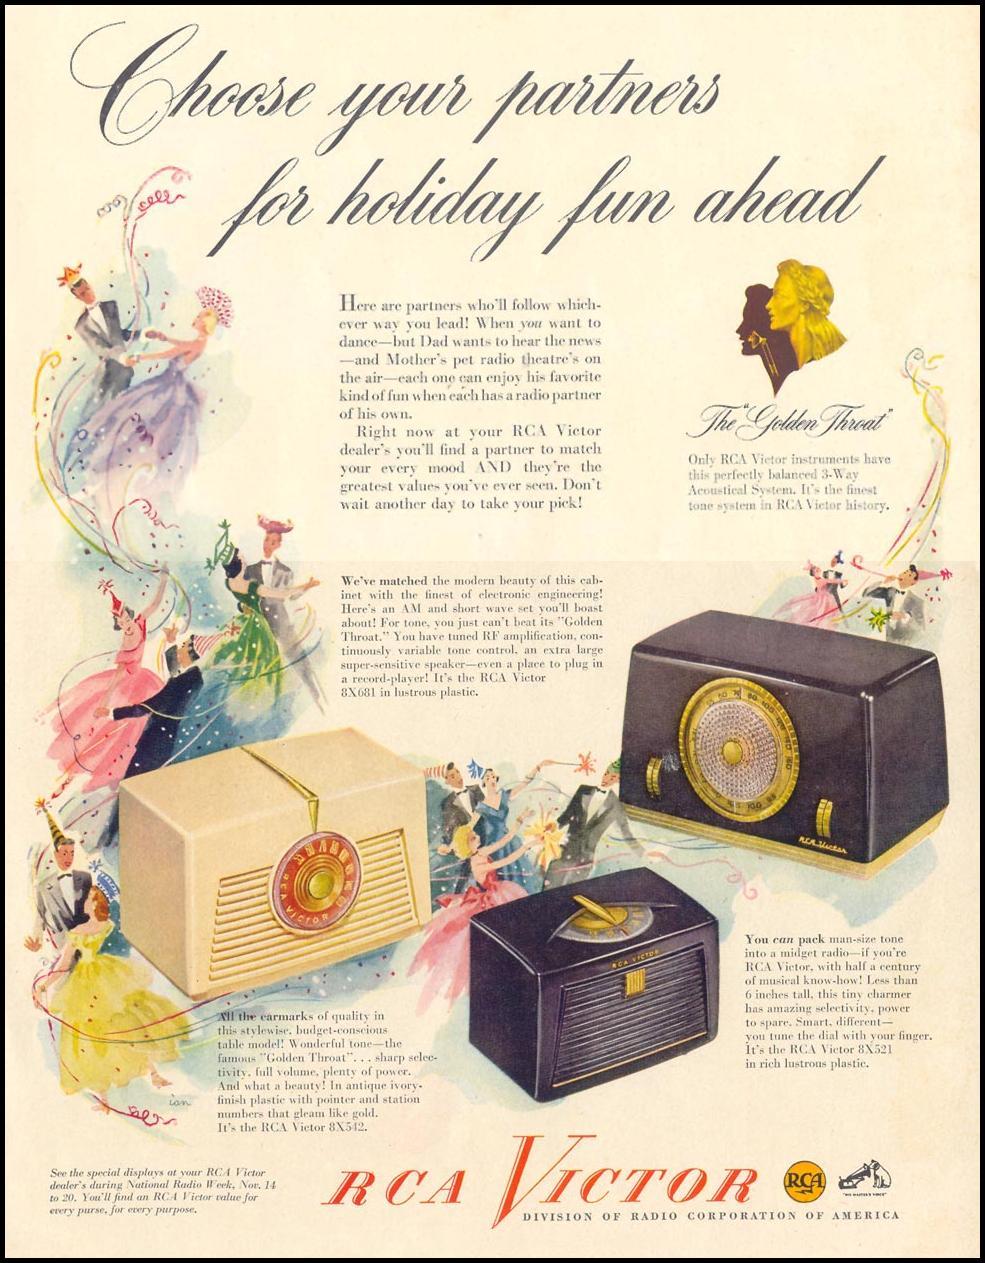 RCA VICTOR RADIOS LIFE 11/15/1948